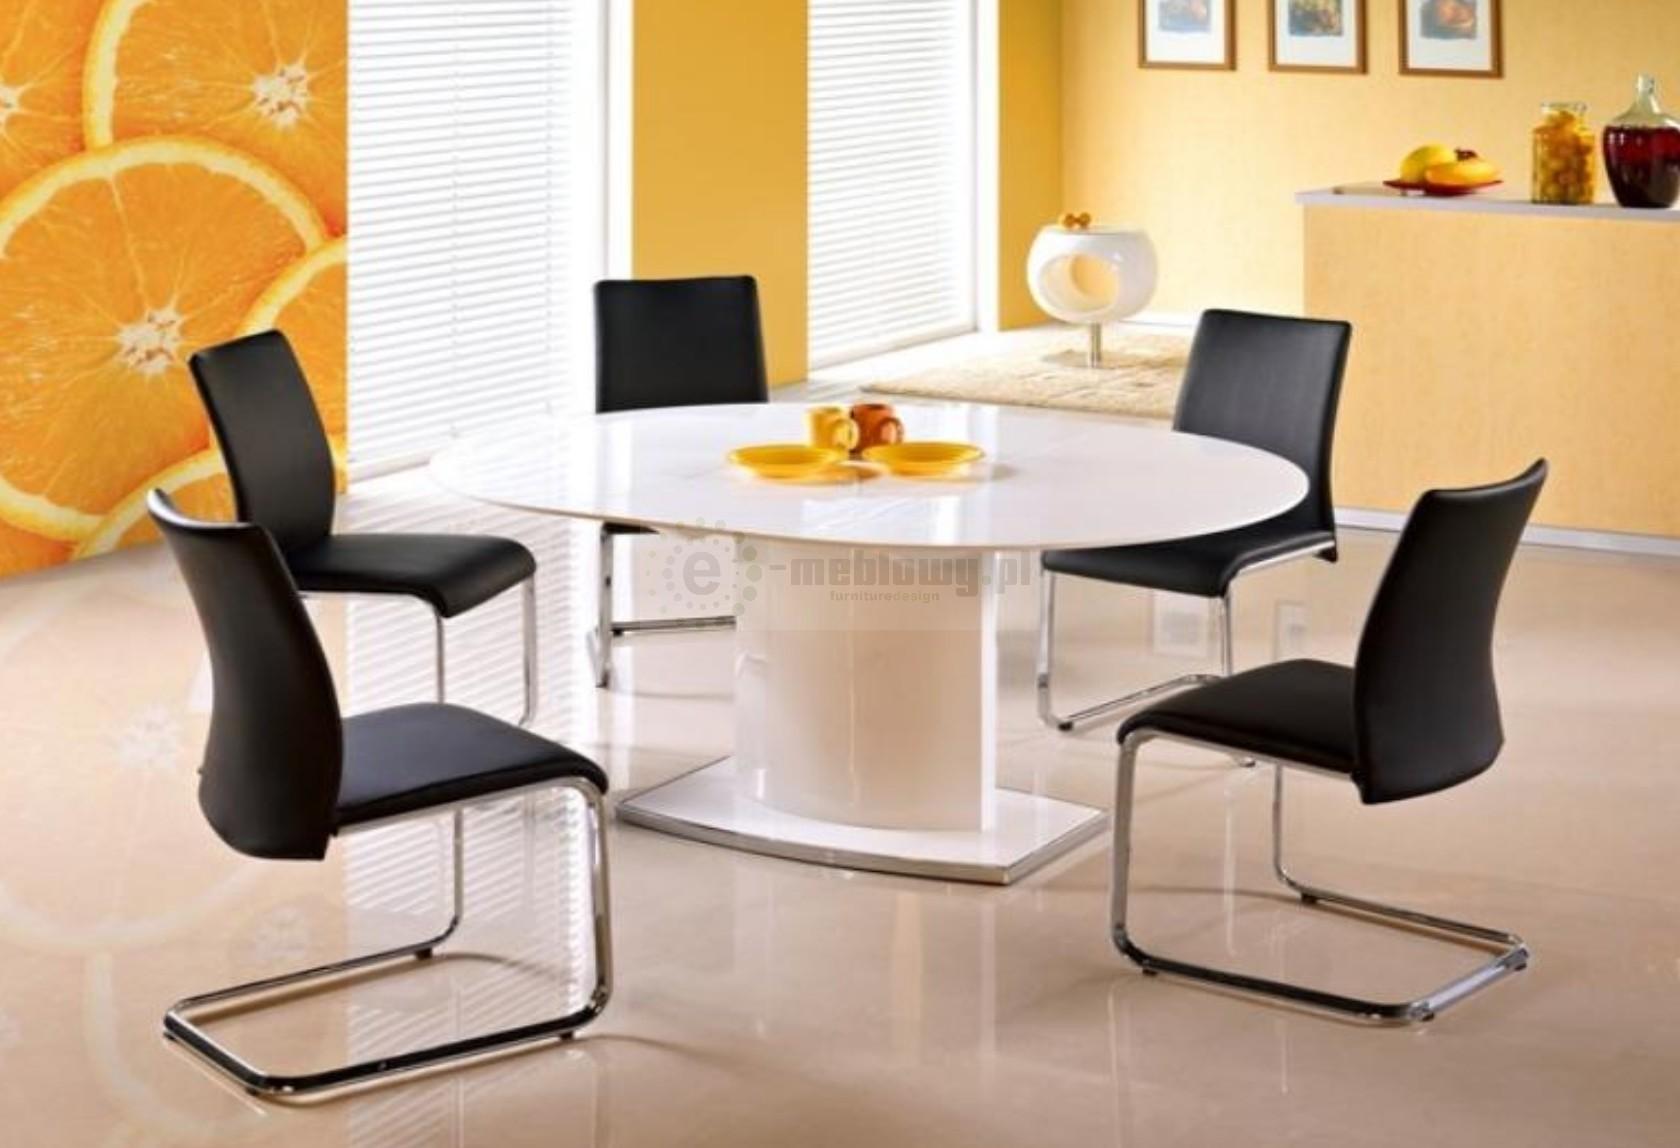 rozk adany st tonga st do jadalni st do salonu. Black Bedroom Furniture Sets. Home Design Ideas